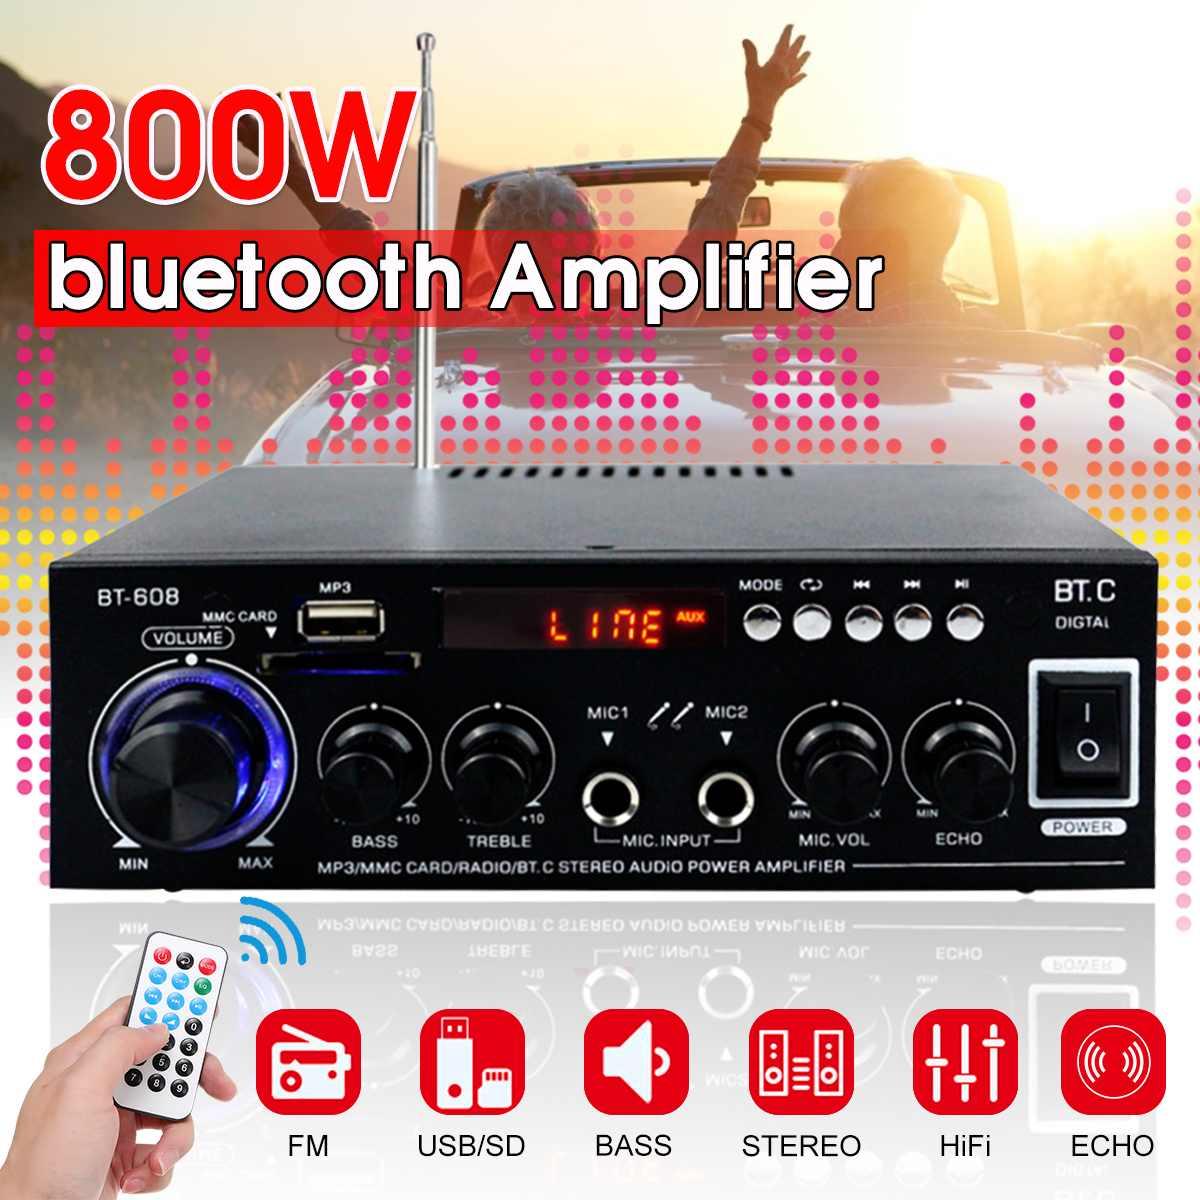 400W + 400W HIFI 2CH 800W аудио Мощность усилитель 110/220V Звук Системы аудио мини усилитель цифровой FM радио USB SD усилители bluetooth